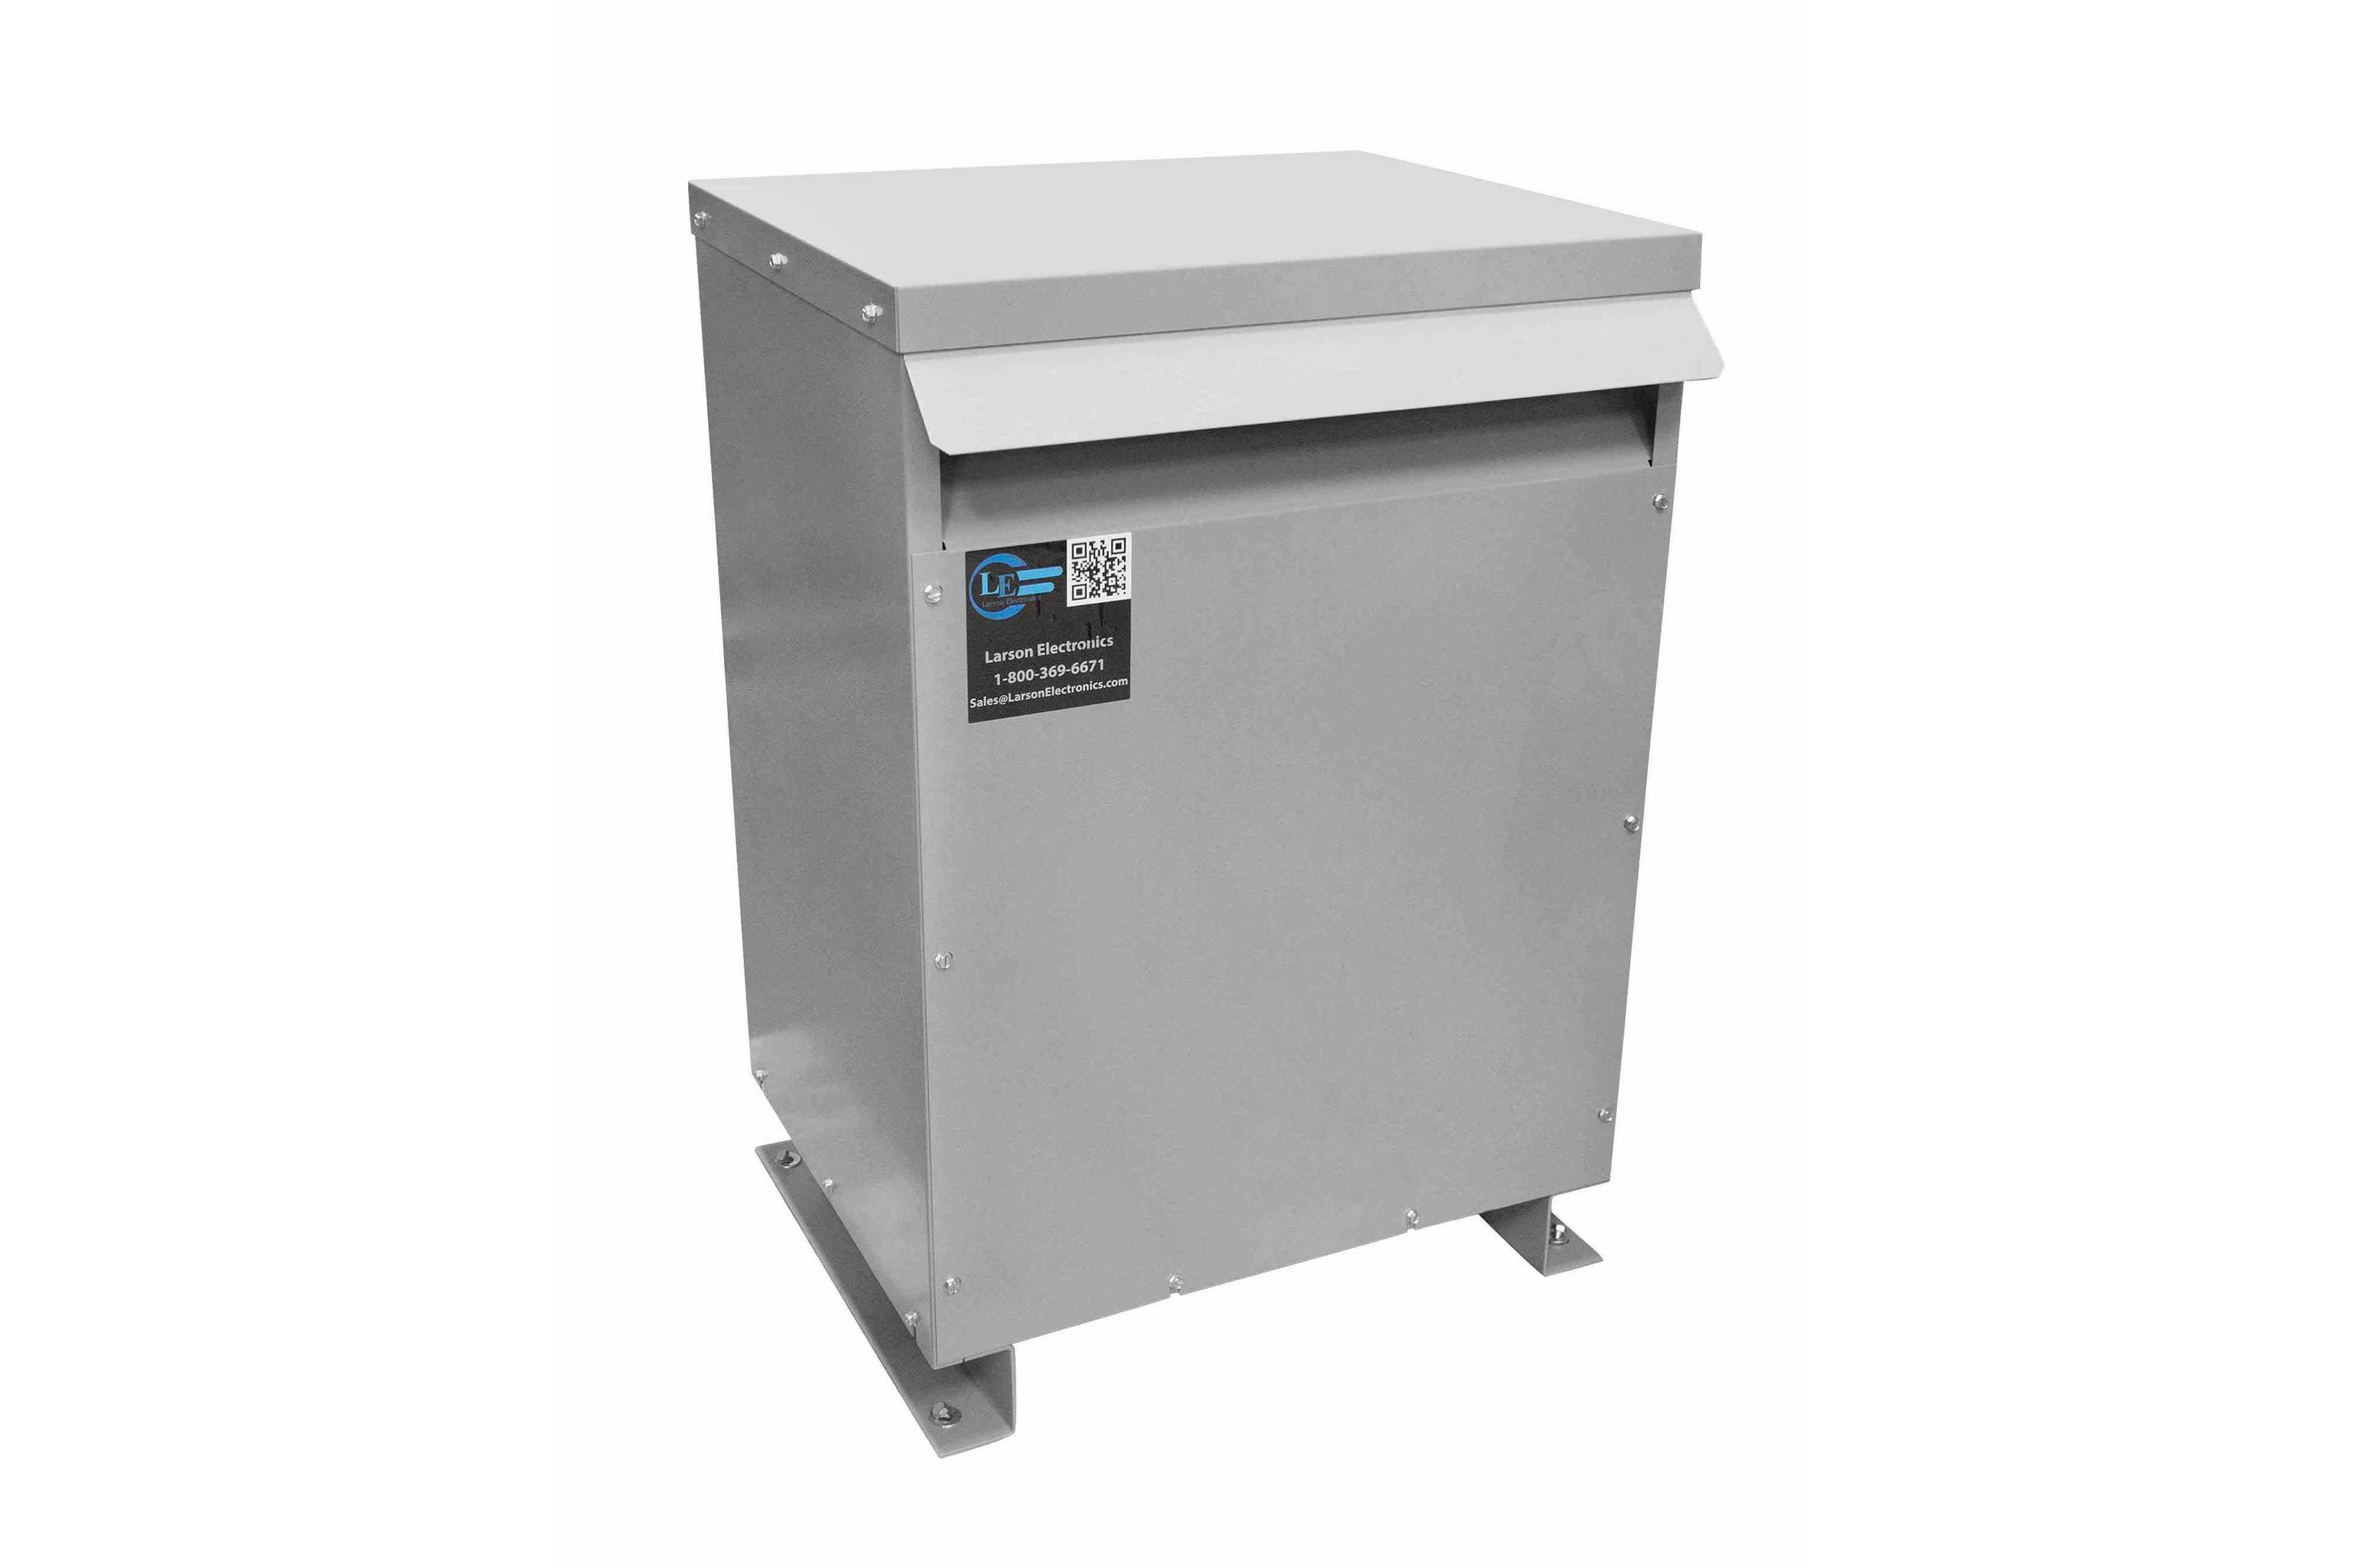 12 kVA 3PH Isolation Transformer, 230V Wye Primary, 208V Delta Secondary, N3R, Ventilated, 60 Hz